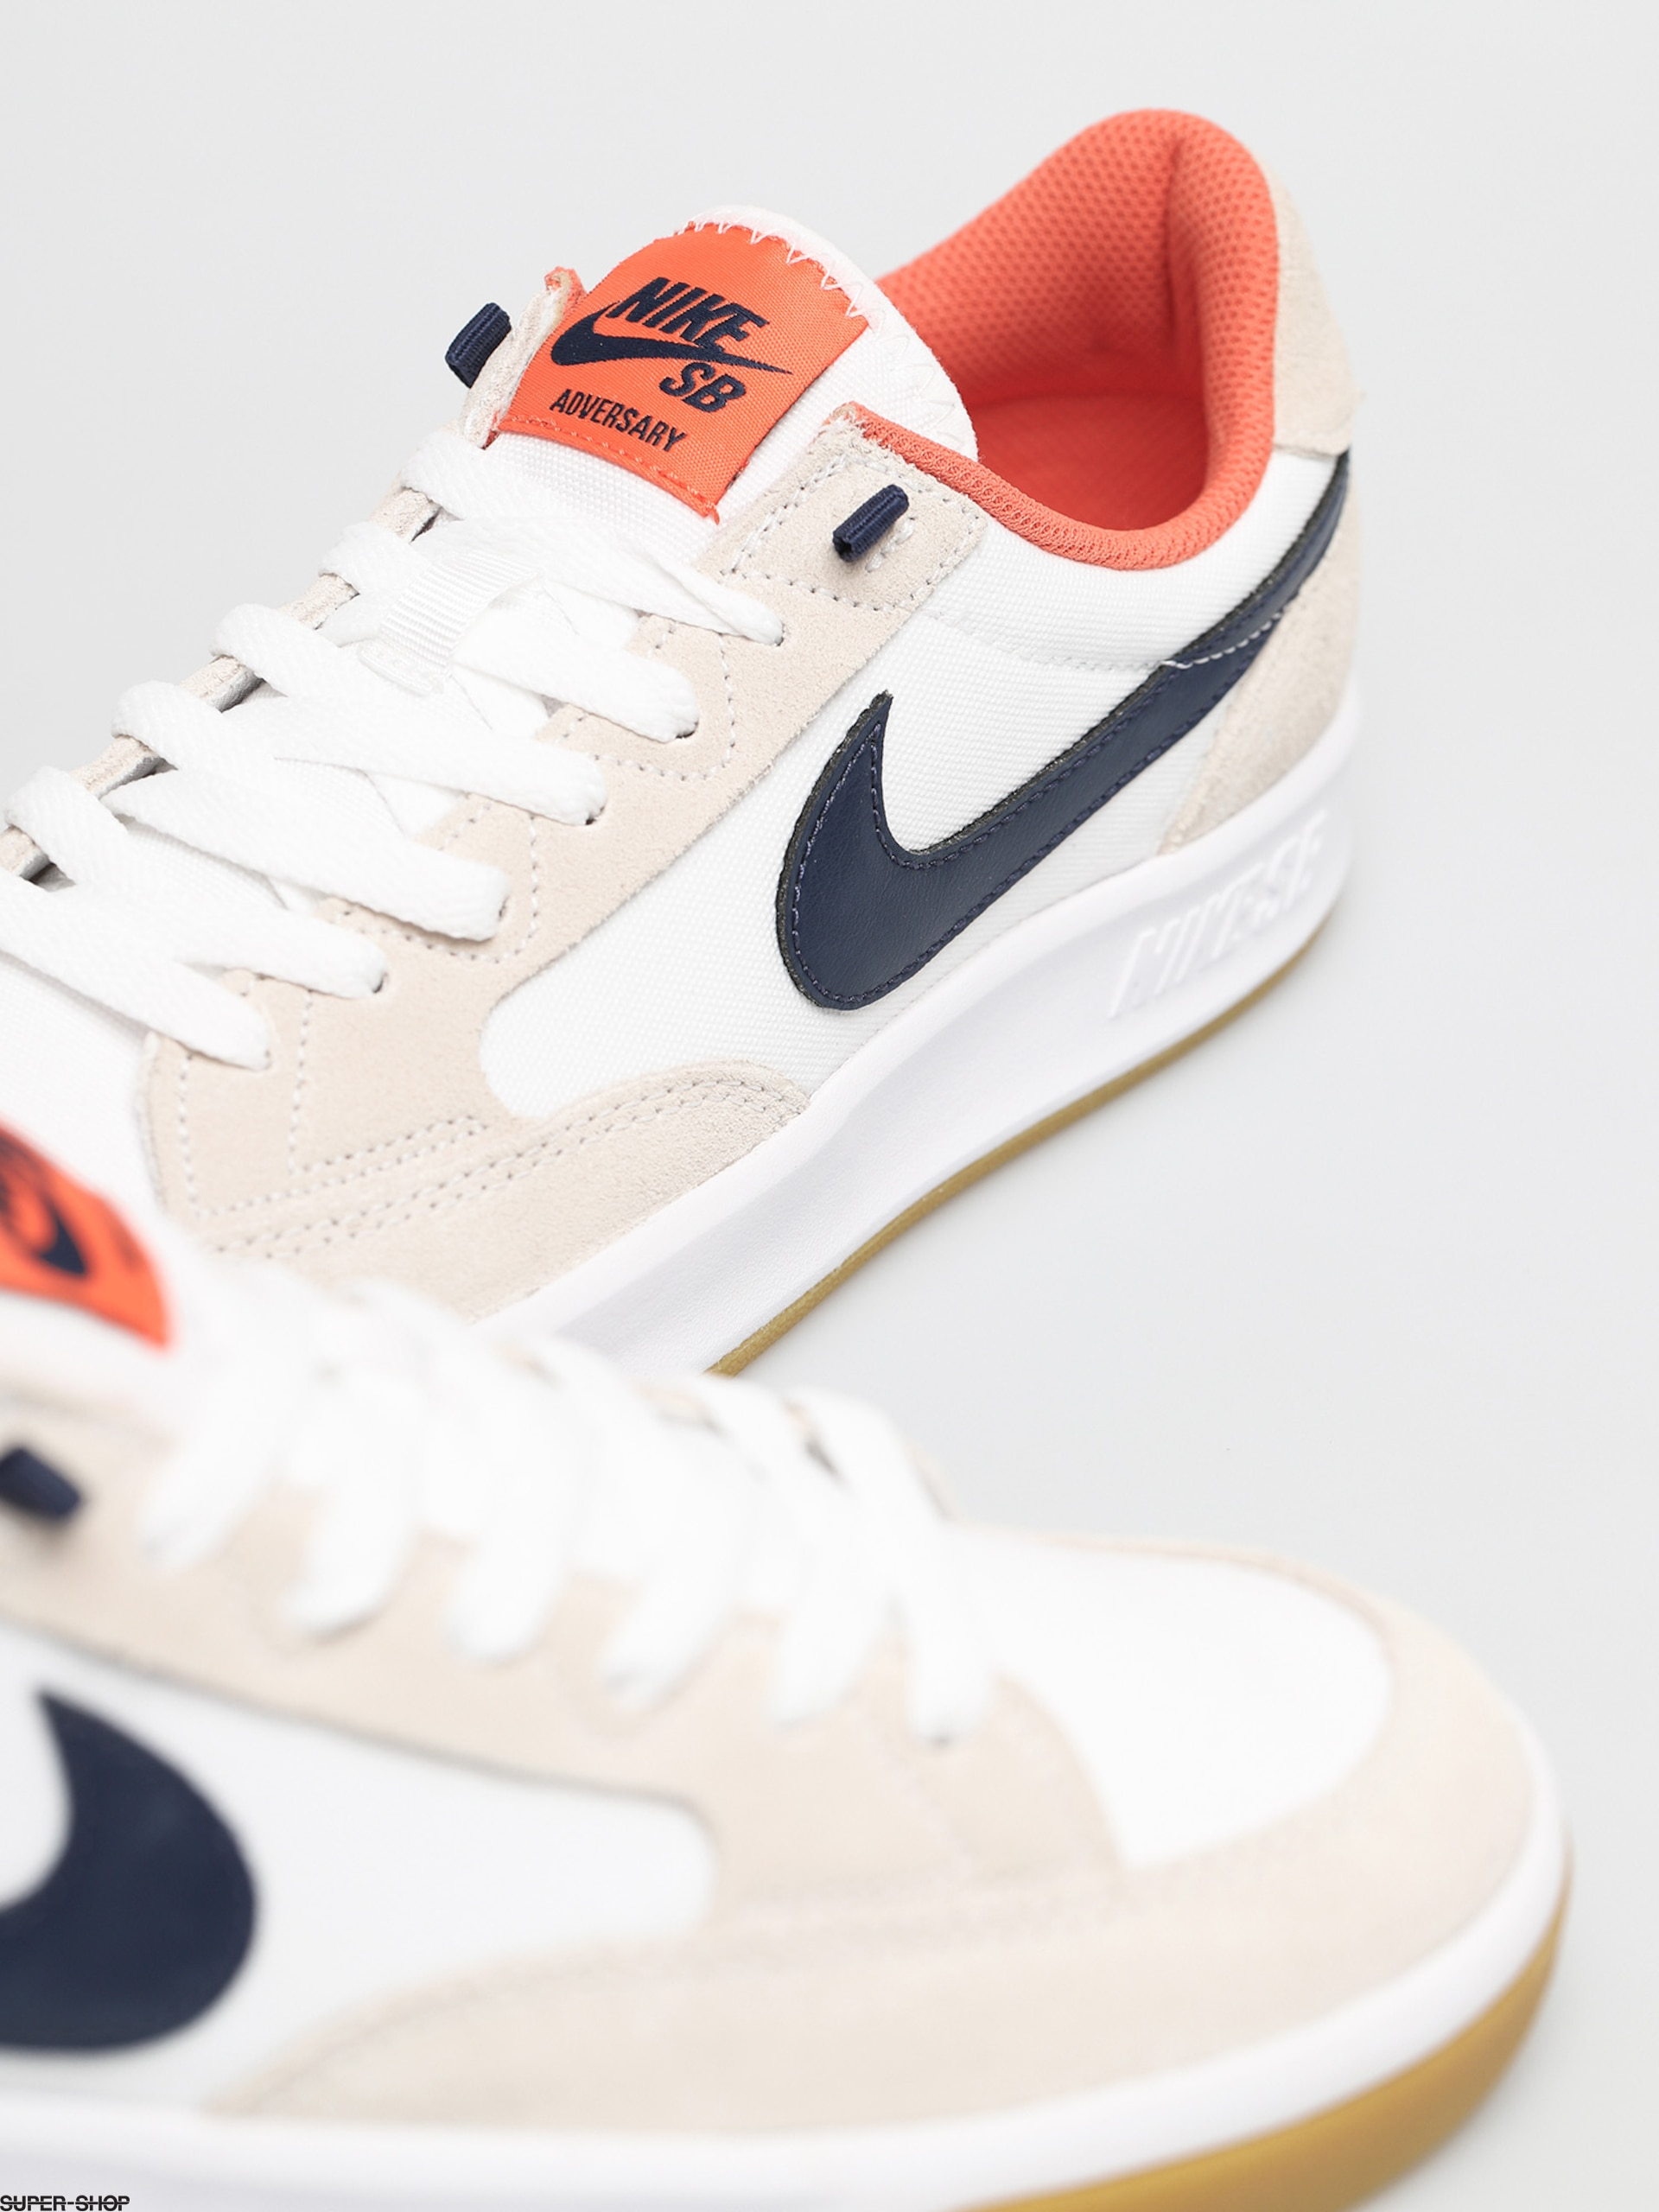 Nike SB Adversary Premium Shoes (white/midnight navy turf orange)